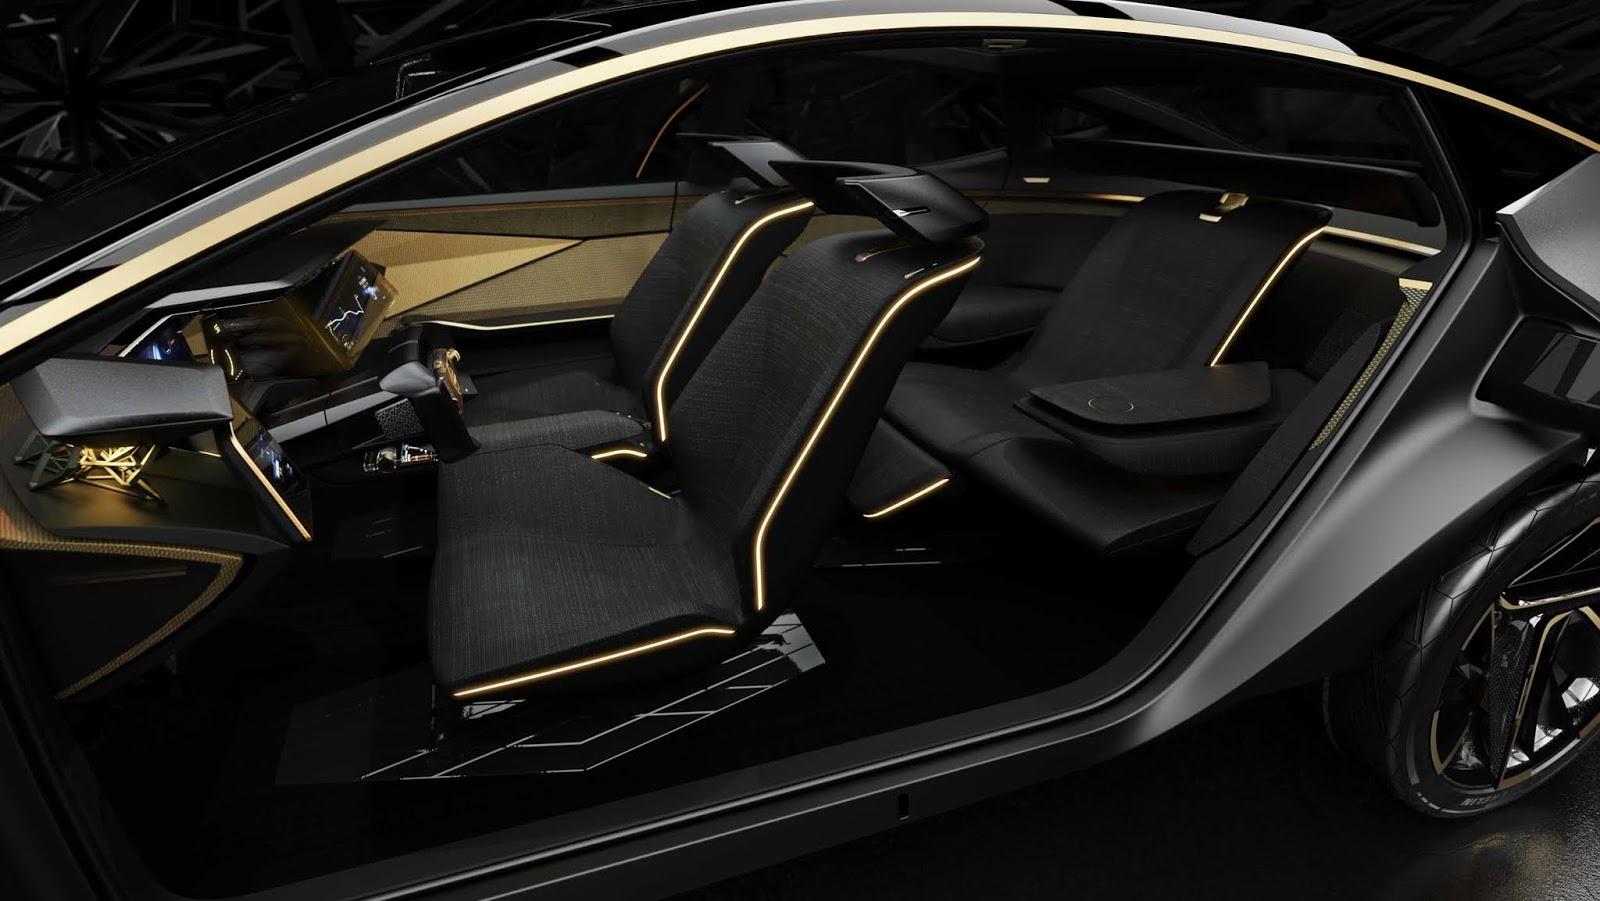 Nissan2BIMs2B252822529 Σου αρέσει το τετρακίνητο σπορ σεντάν της Nissan; Electric cars, Nissan, video, videos, zblog, αυτόνομα, Αυτόνομη οδήγηση, βίντεο, τετρακίνητα, τετρακίνητο